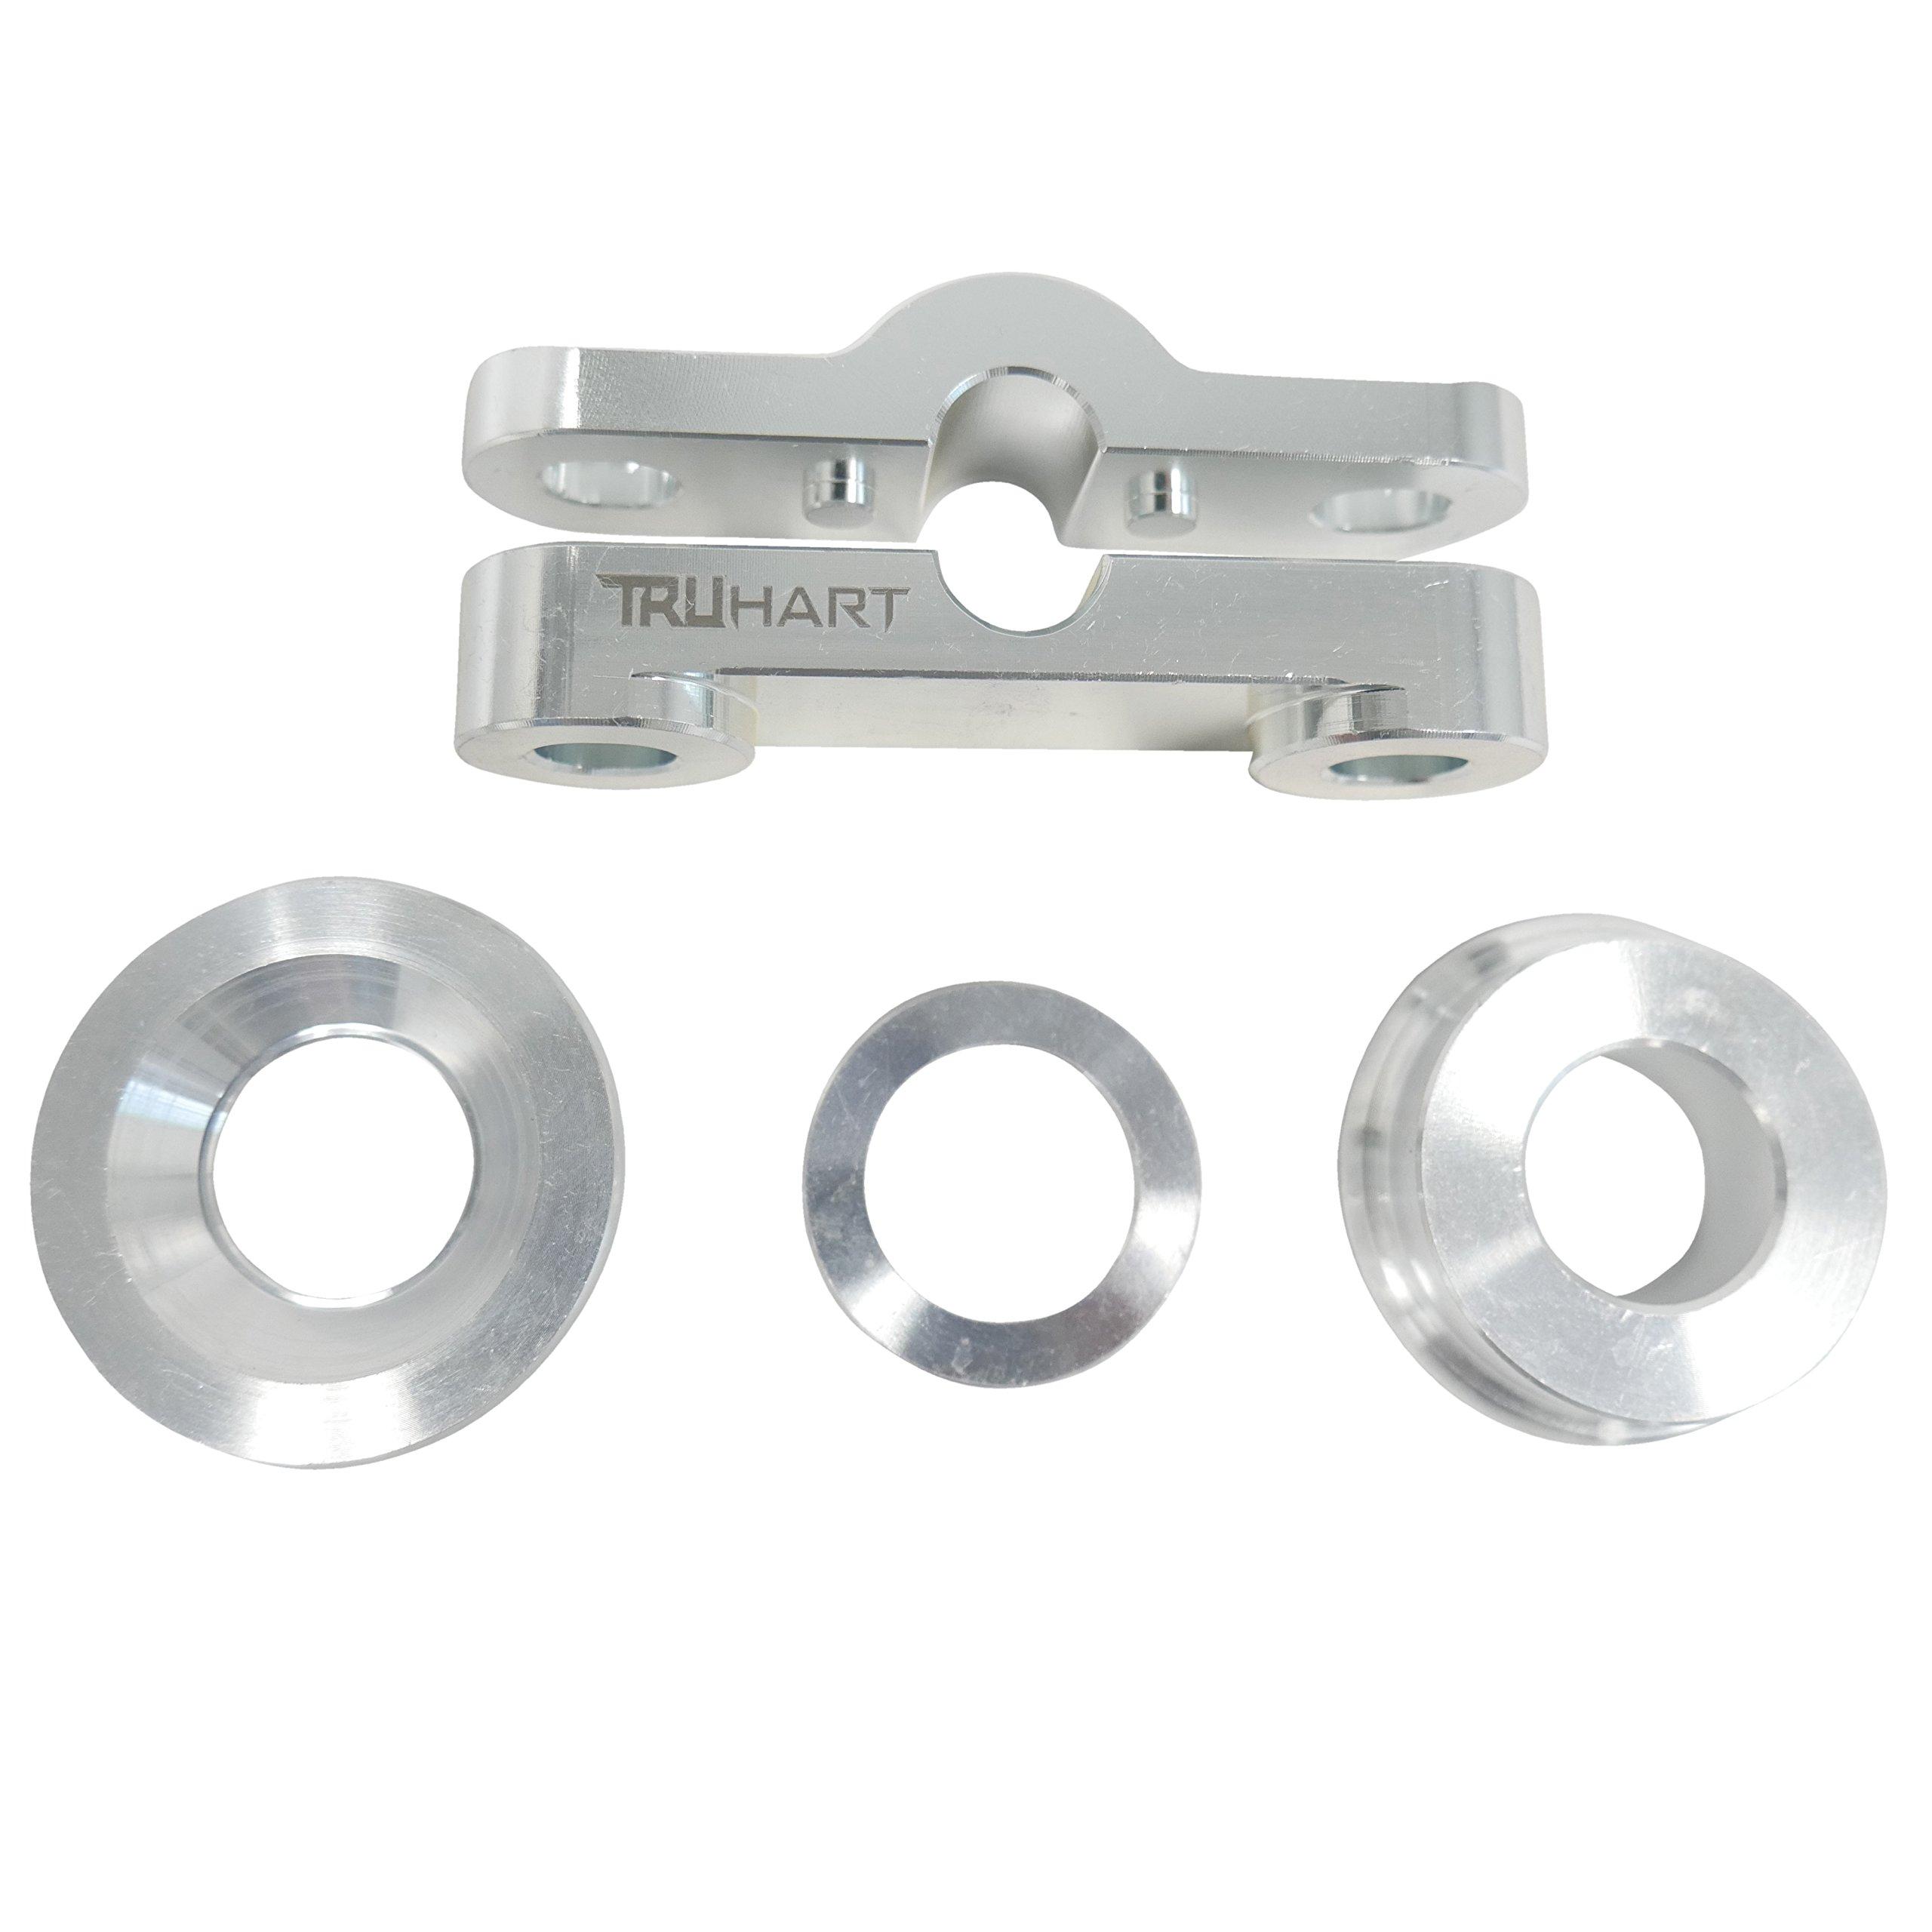 Truhart Billet CNC Aluminum Shifter Bushings B- Series Civic Integra DOHC